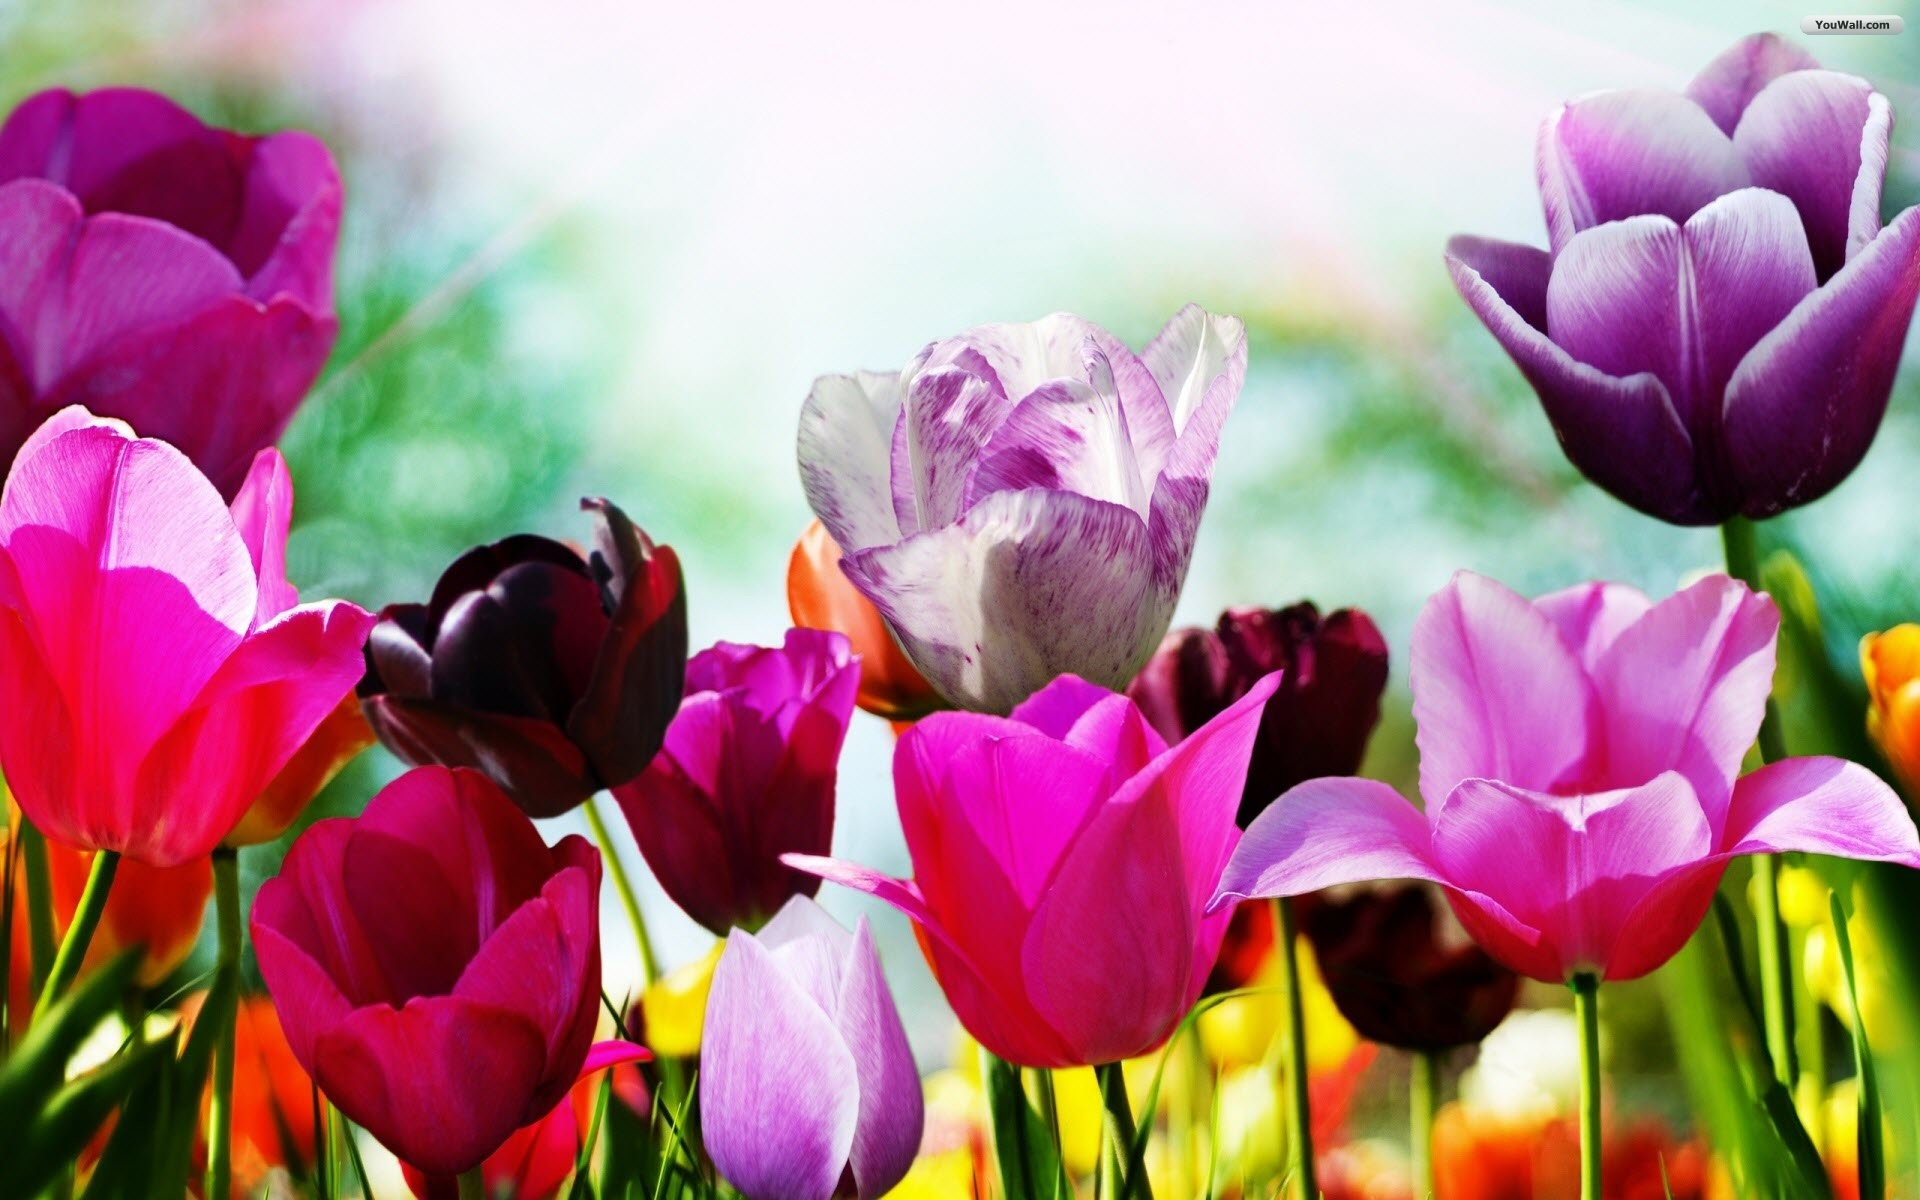 Free Desktop Wallpaper | Spring Wallpaper – wallpaper,wallpapers,free  wallpaper,photo,